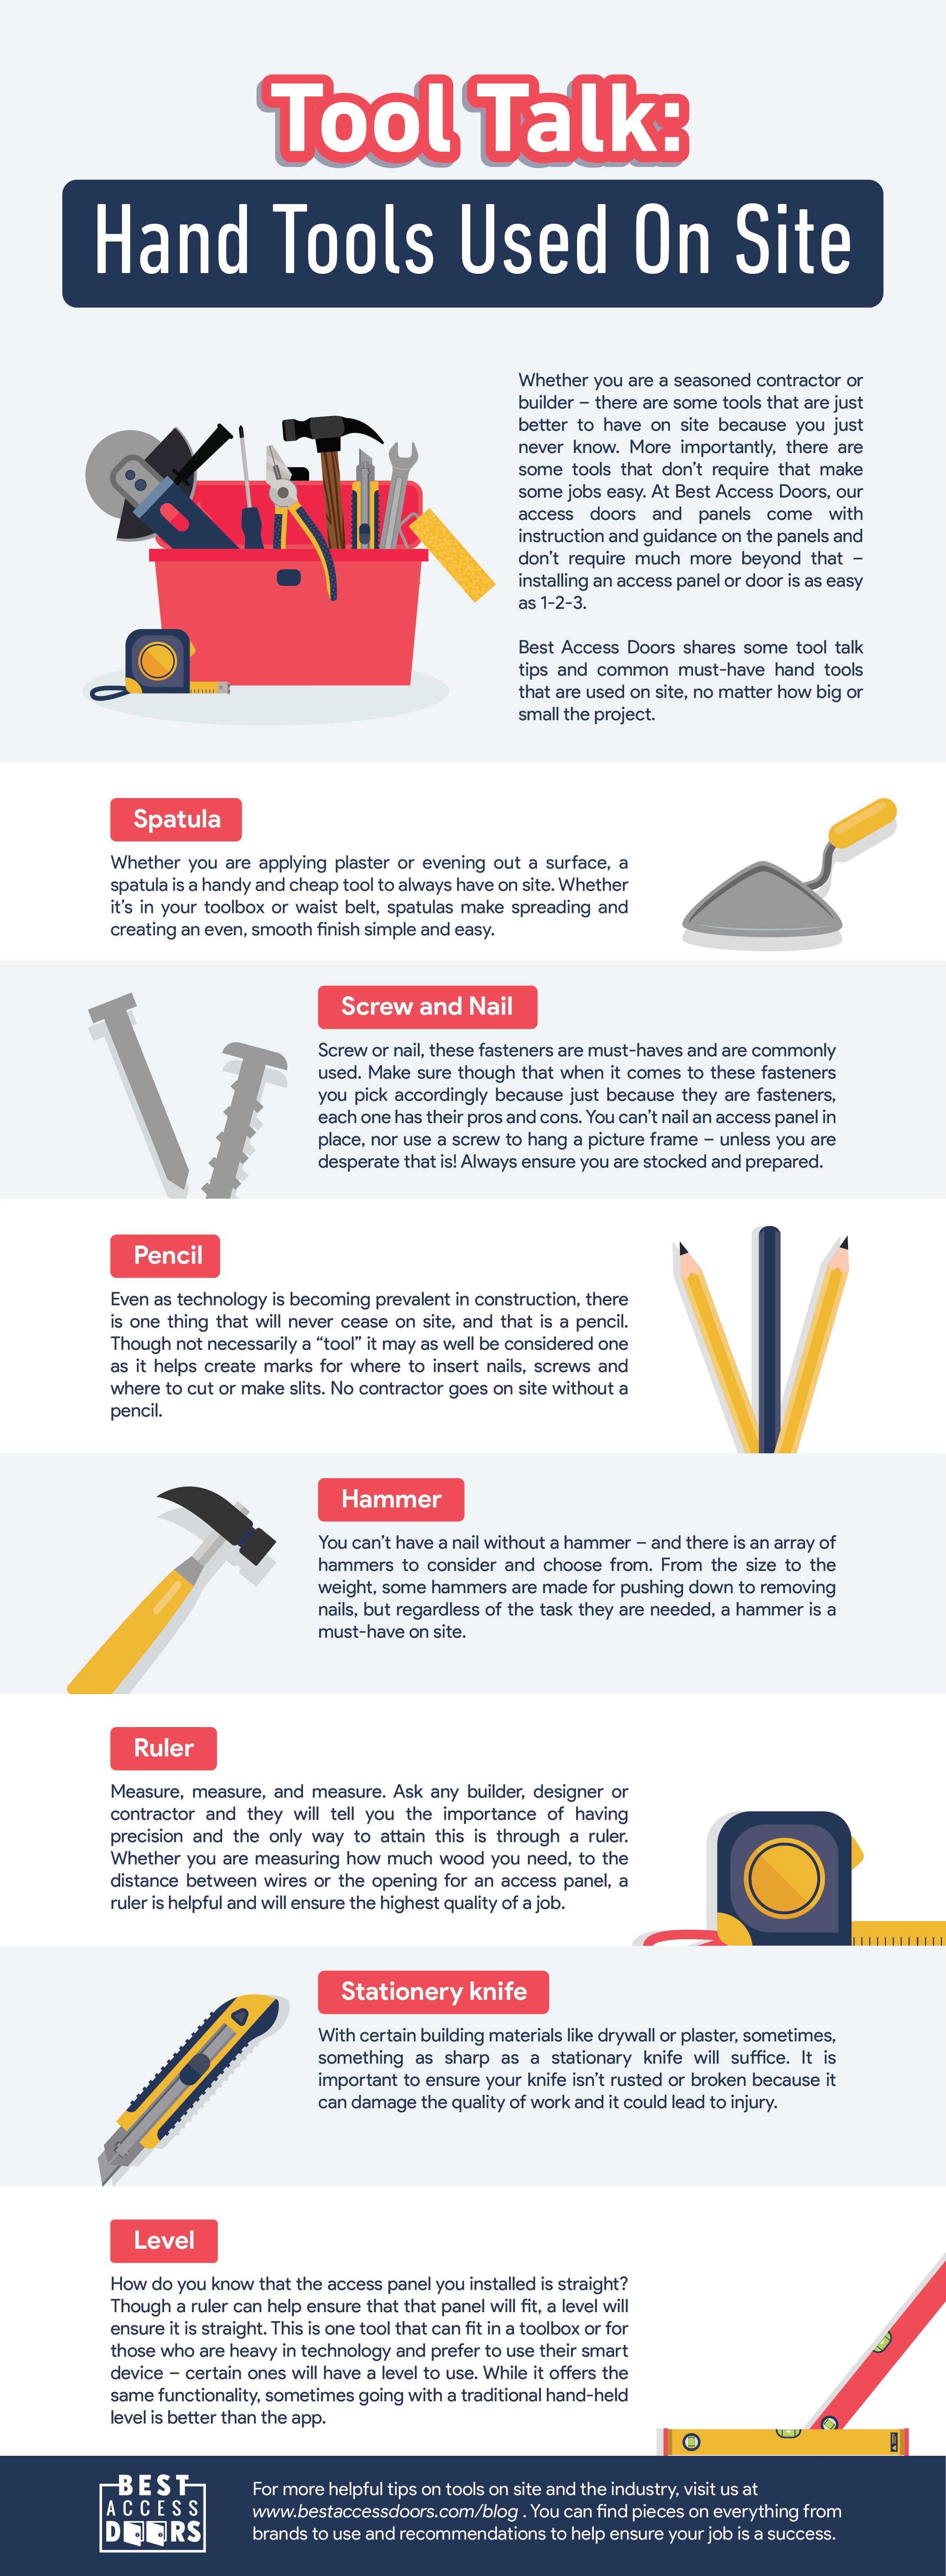 Tools Of The Trade Construction Industry Hand Tools Tools Cordless Circular Saw